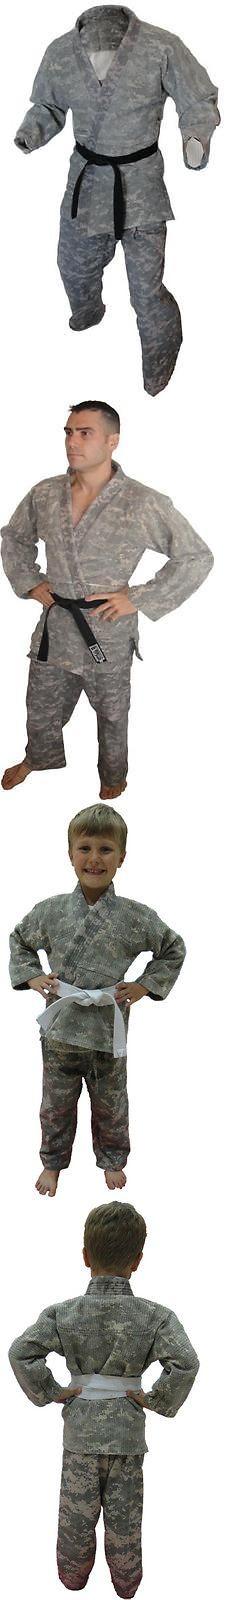 Uniforms and Gis 179774: New Army Camo Bjj Gi, Acu, Judo, Jiu Jitsu Kimono -> BUY IT NOW ONLY: $59.99 on eBay!